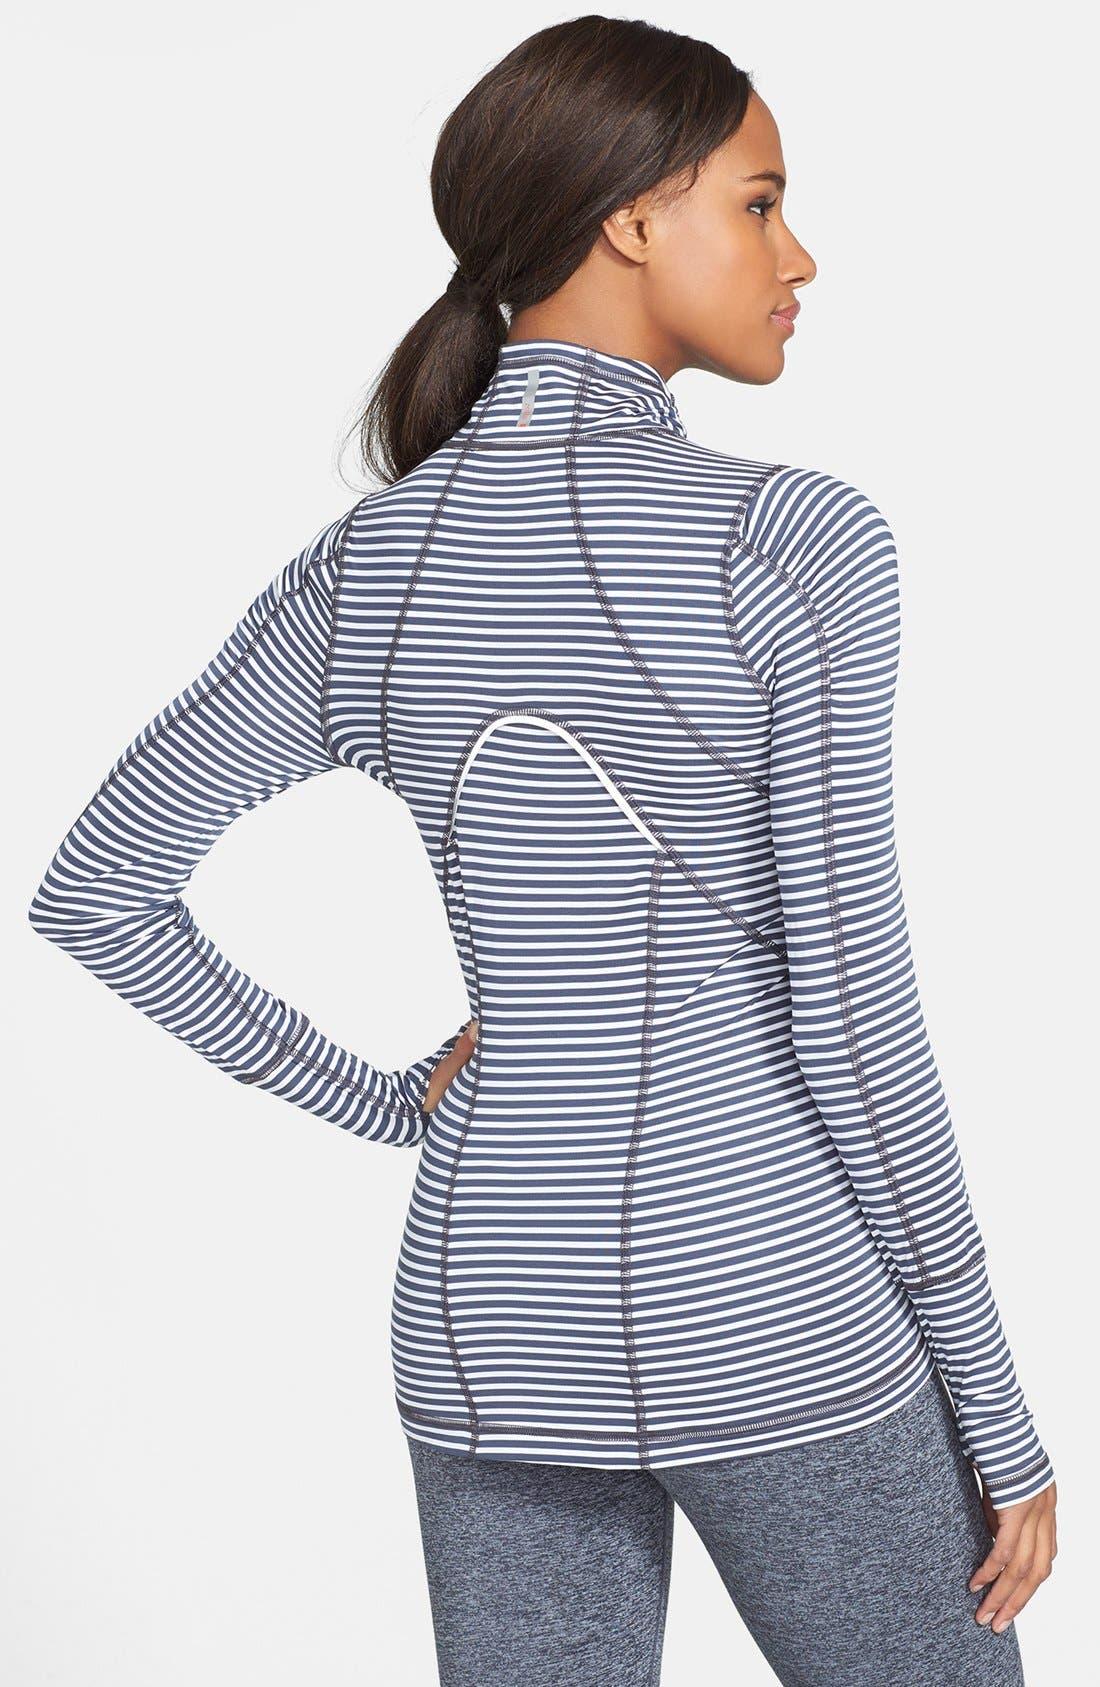 'Run' Stripe Half Zip Pullover,                             Alternate thumbnail 3, color,                             020